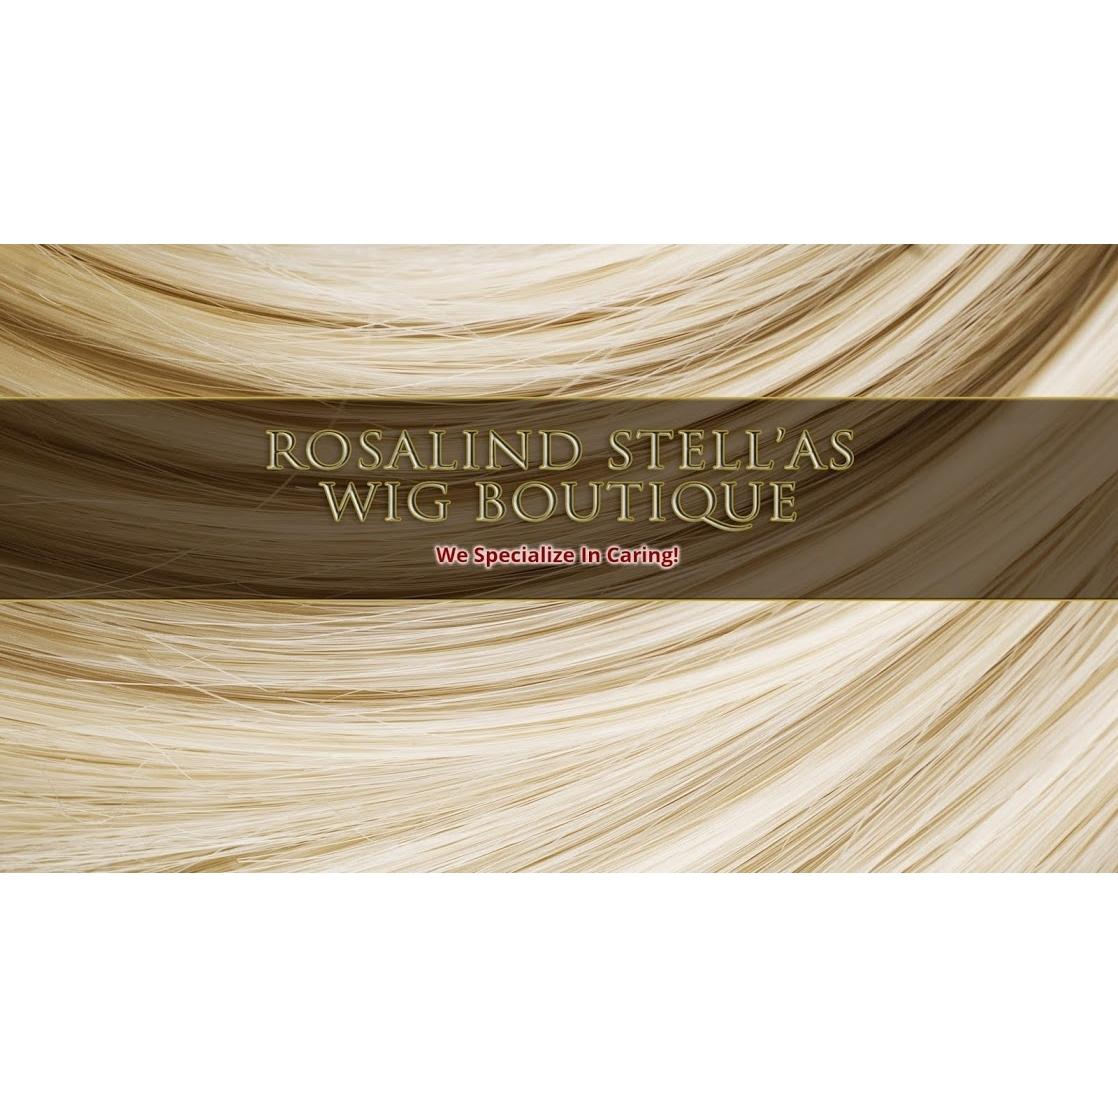 Rosalind Stella's Wig Boutique - Philadelphia, PA 19115 - (215)725-3930 | ShowMeLocal.com